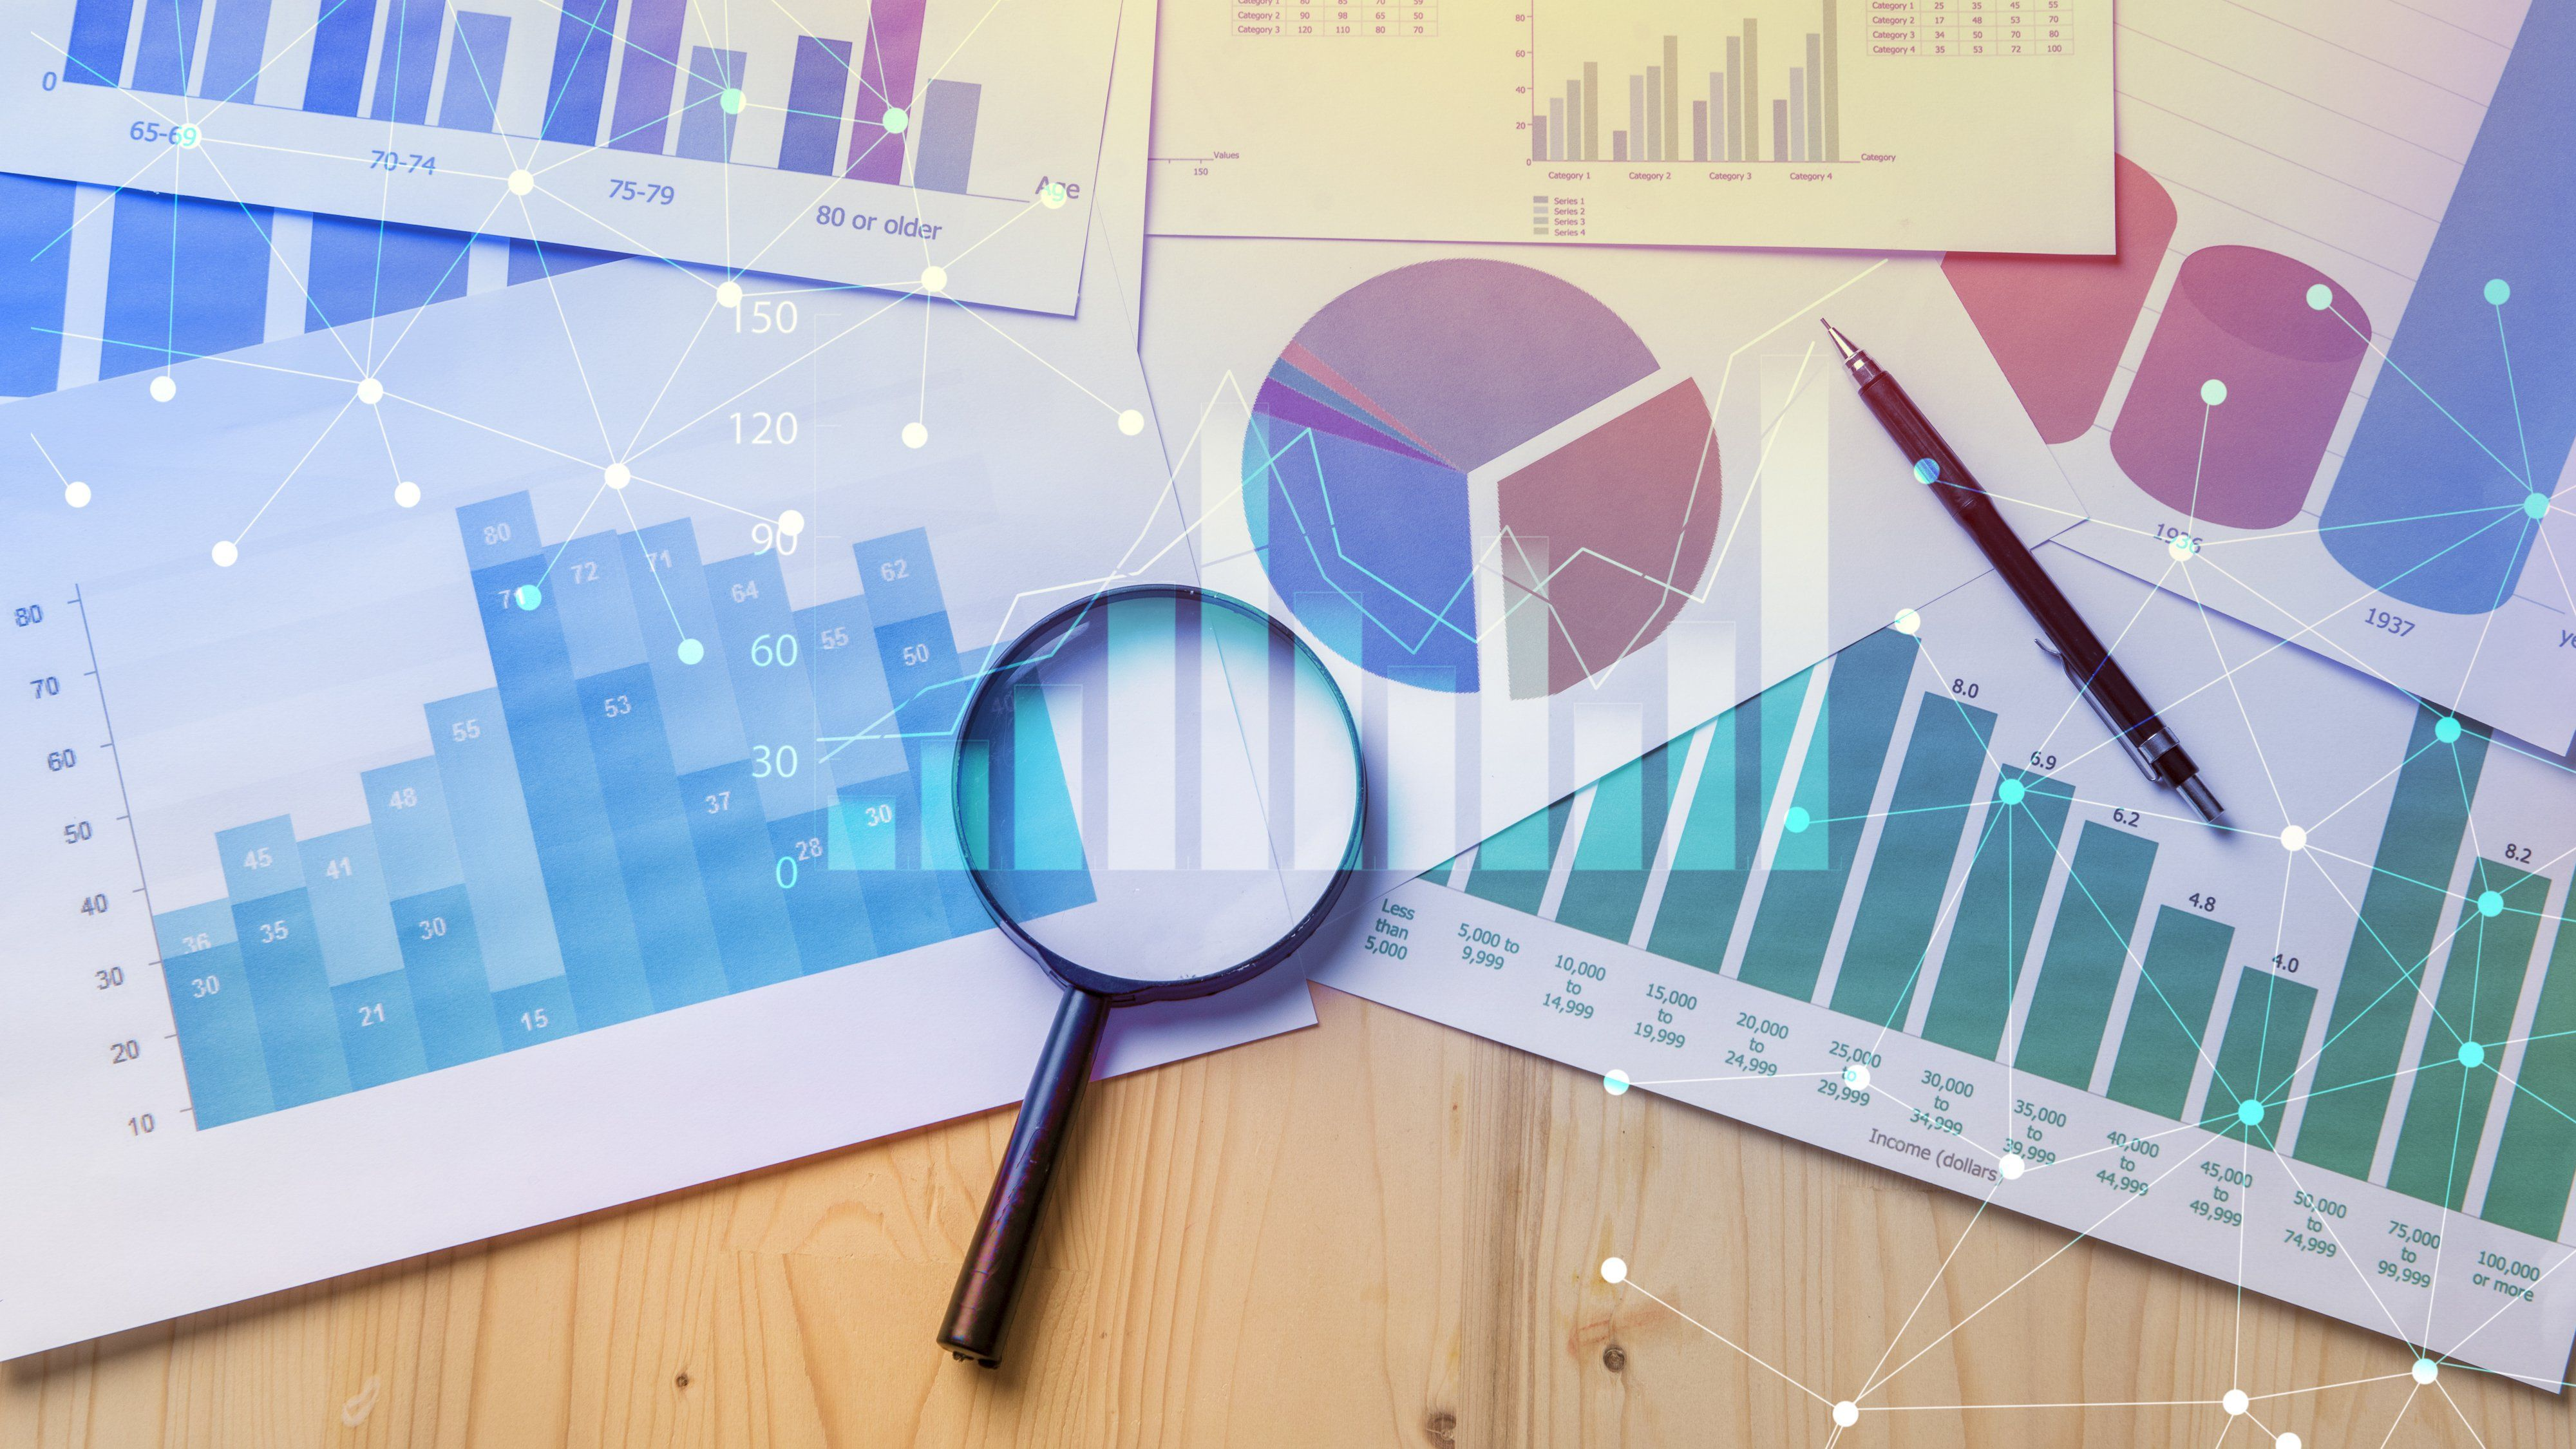 Adit Ventures Q2 2020 Review & Outlook